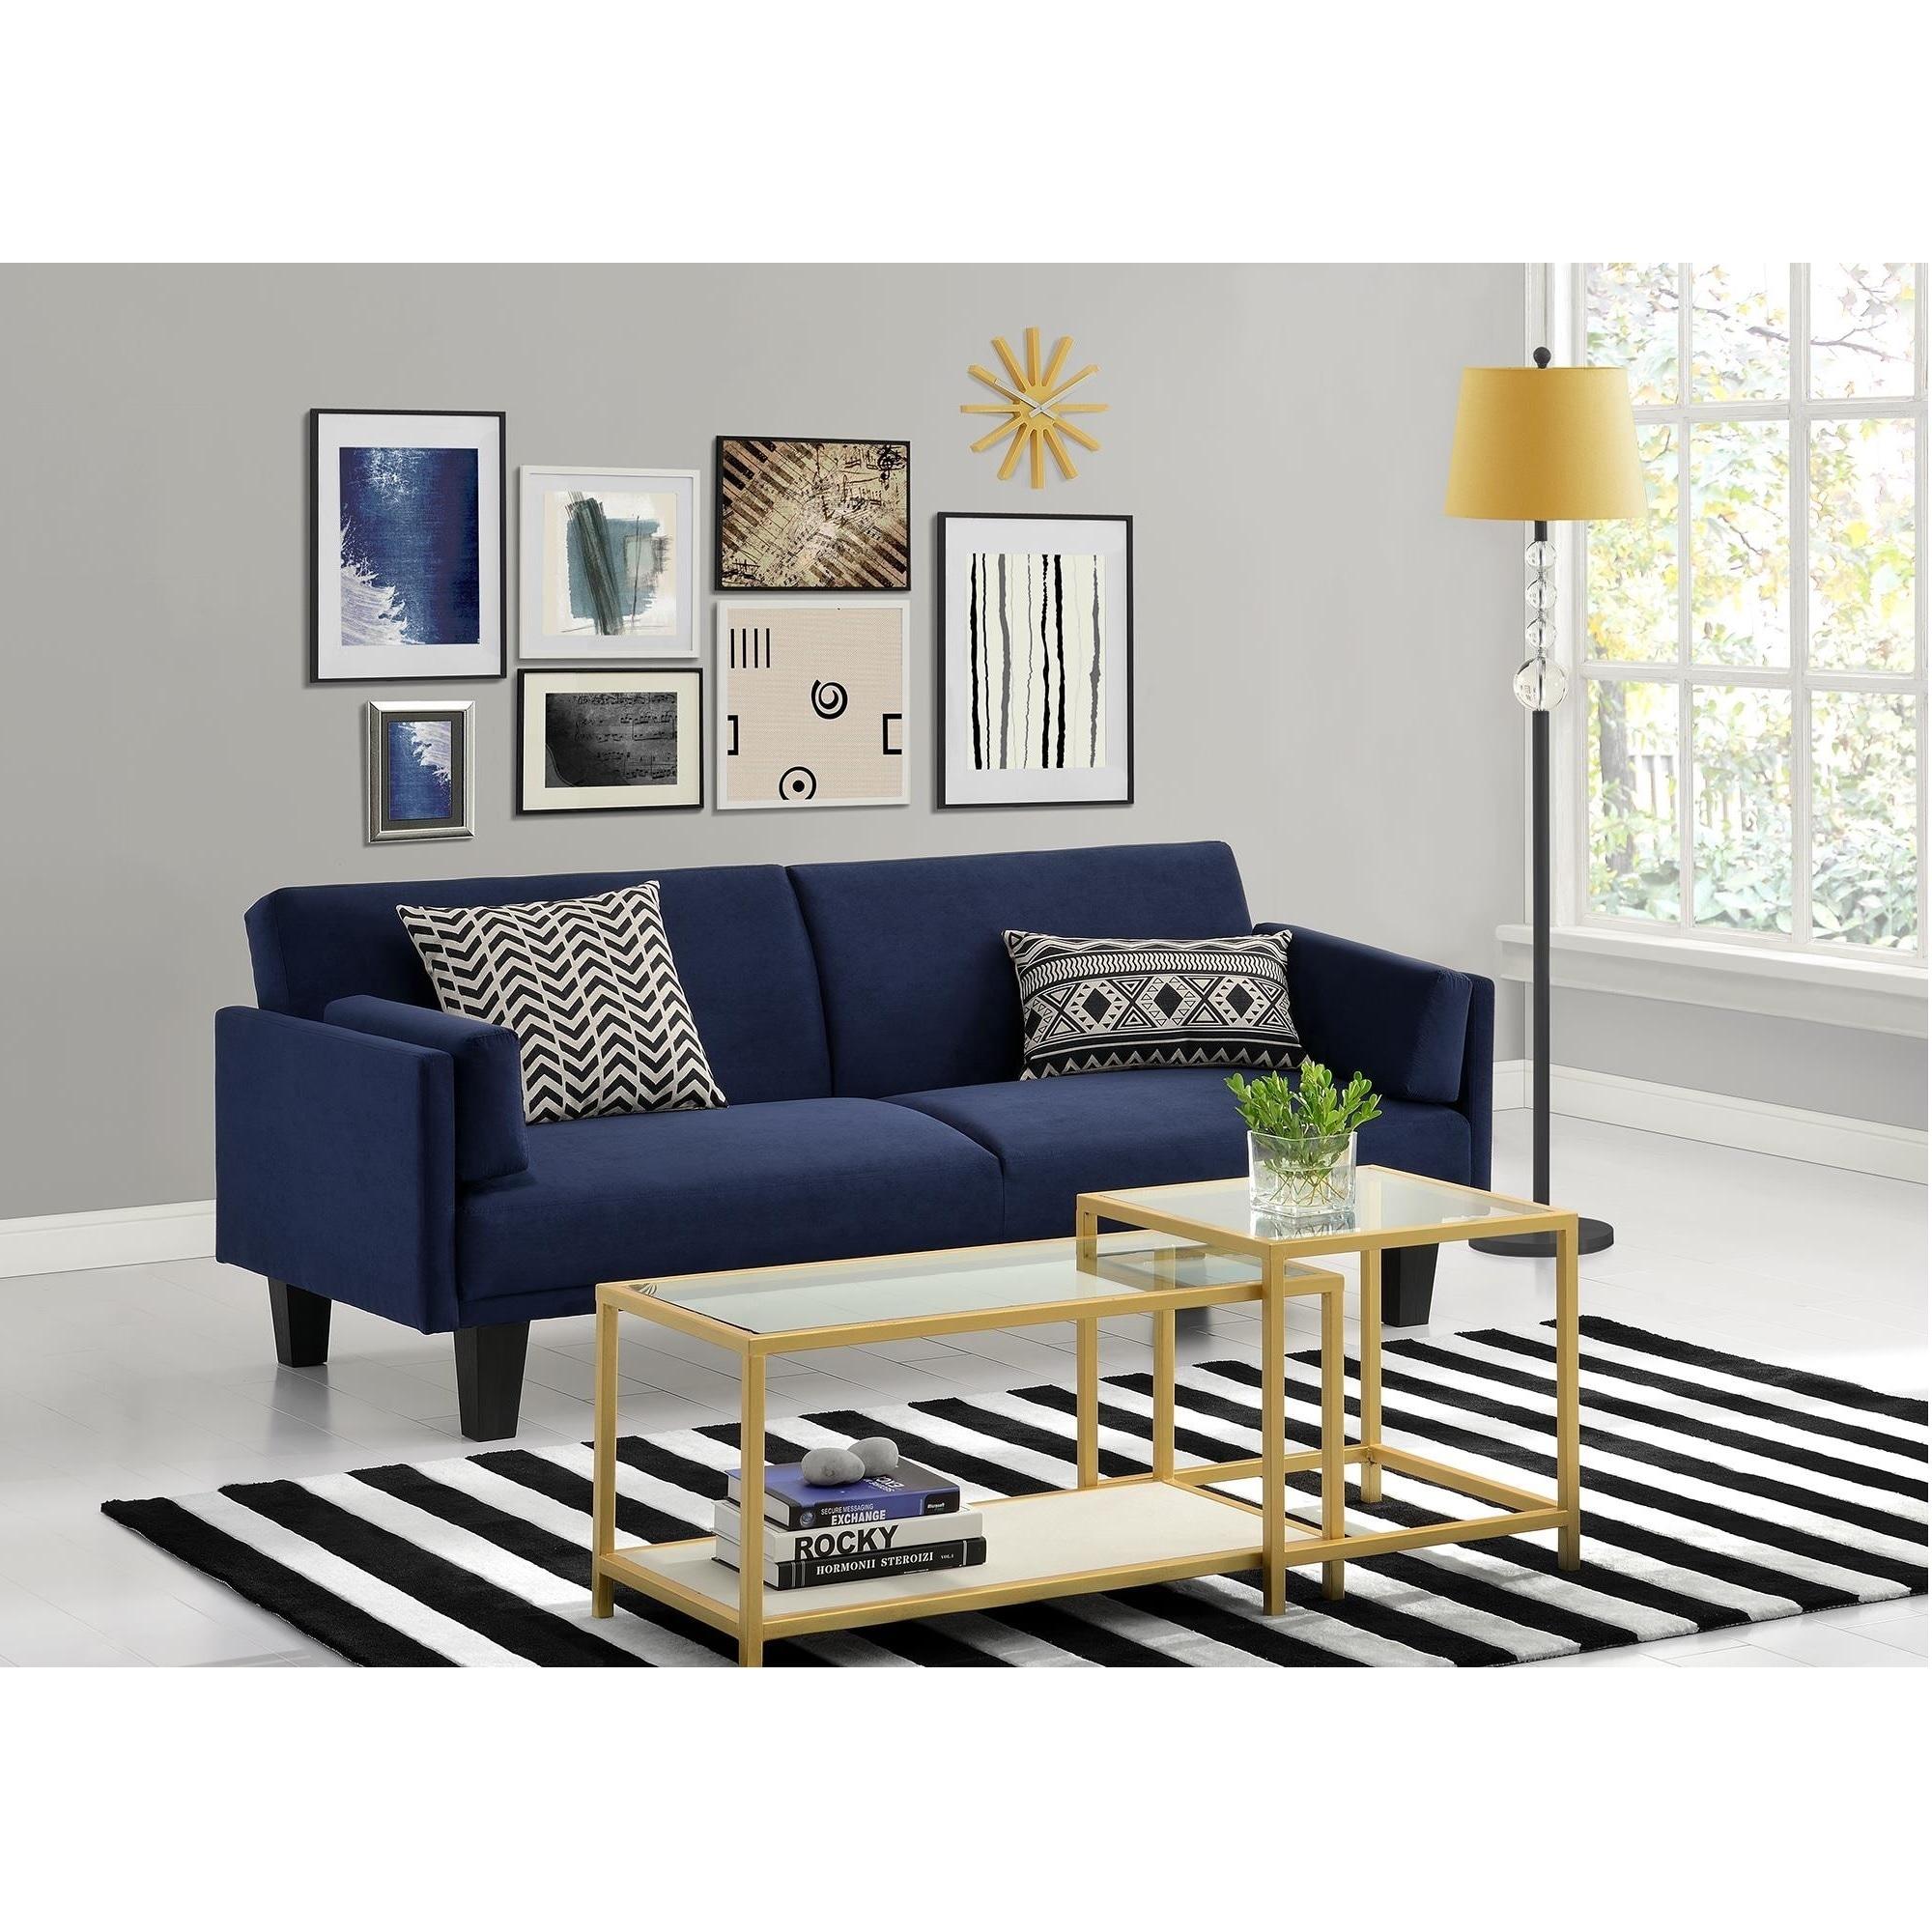 Shop Dhp Metro Navy Blue Futon Sofa Bed Free Shipping Today